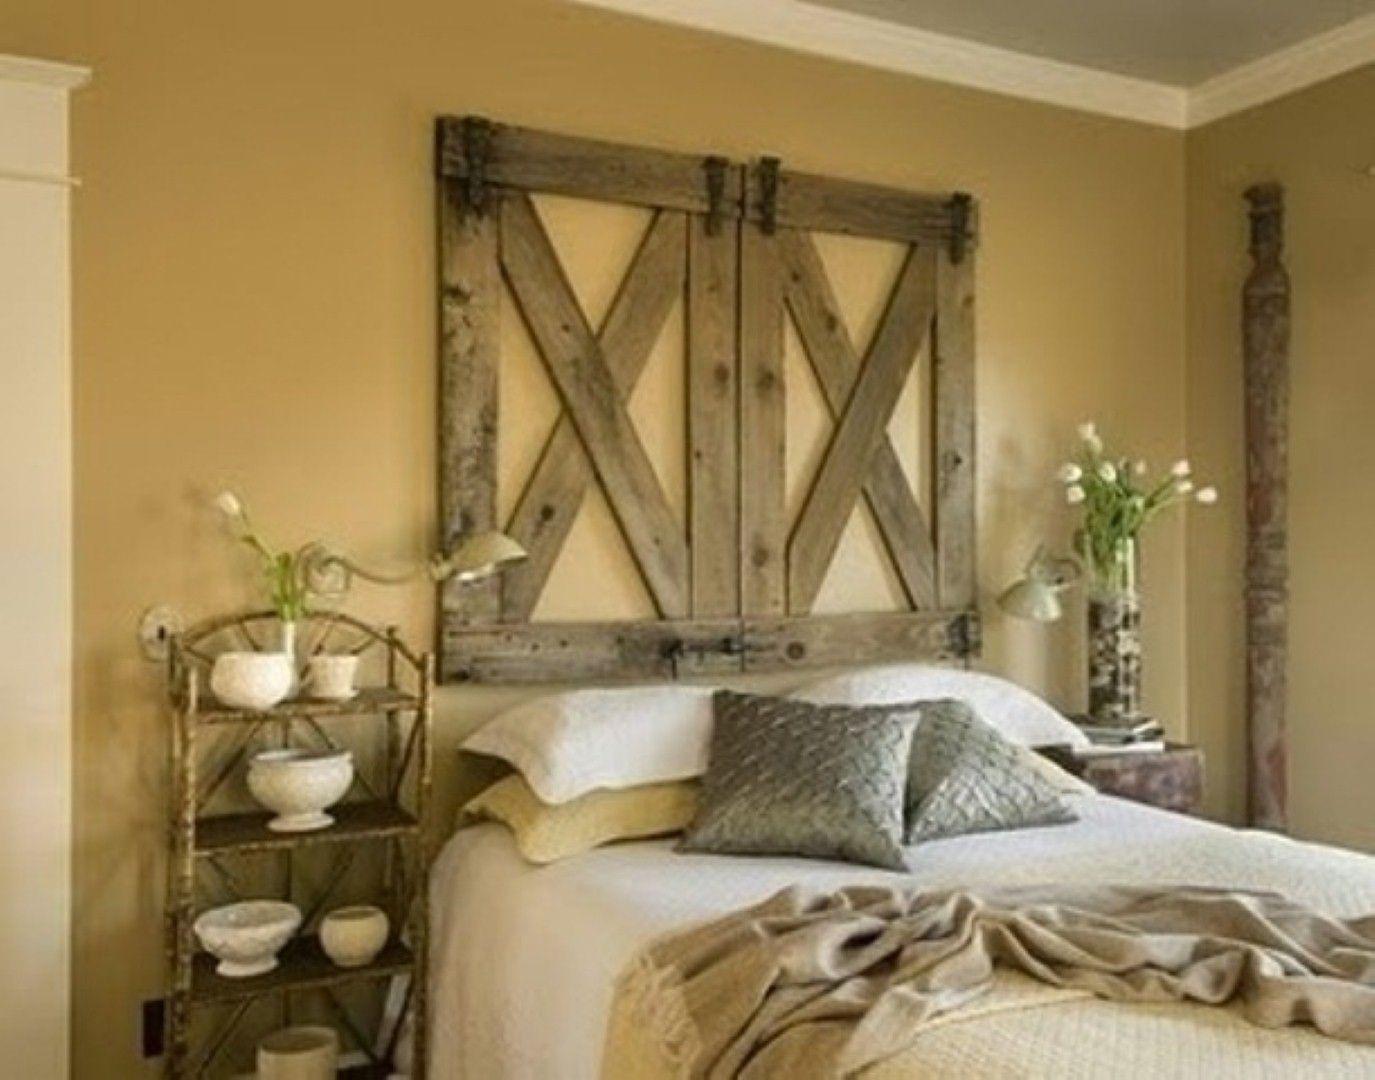 diy rustic bedroom ideas diy rustic decor   Better Homes ...